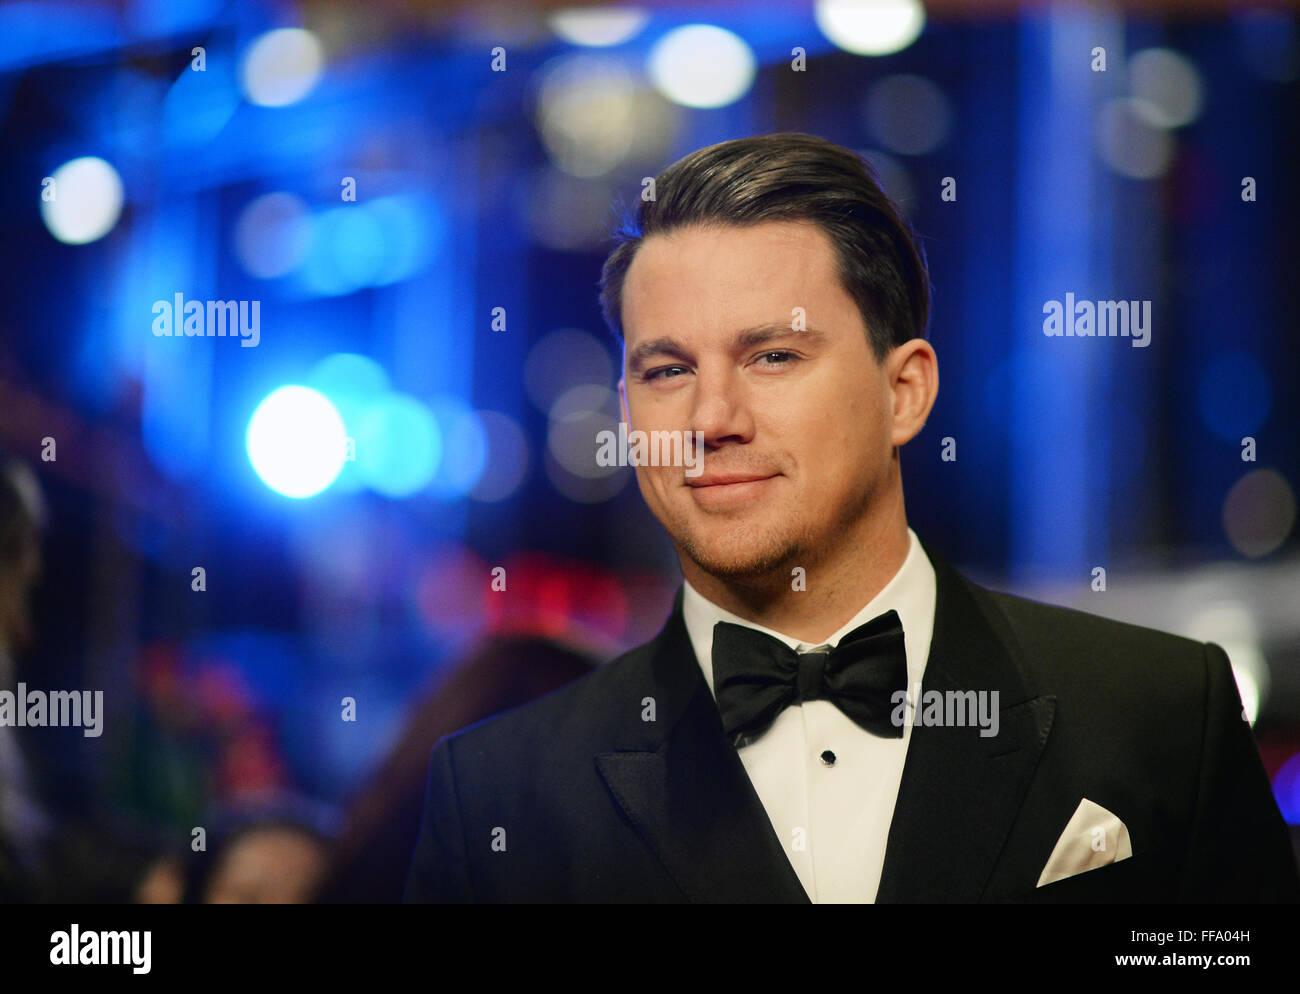 Berlin, Deutschland. 11. Februar 2016. 66. Internationalen Filmfestspiele in Berlin, Deutschland, 11. Februar 2016. Stockbild